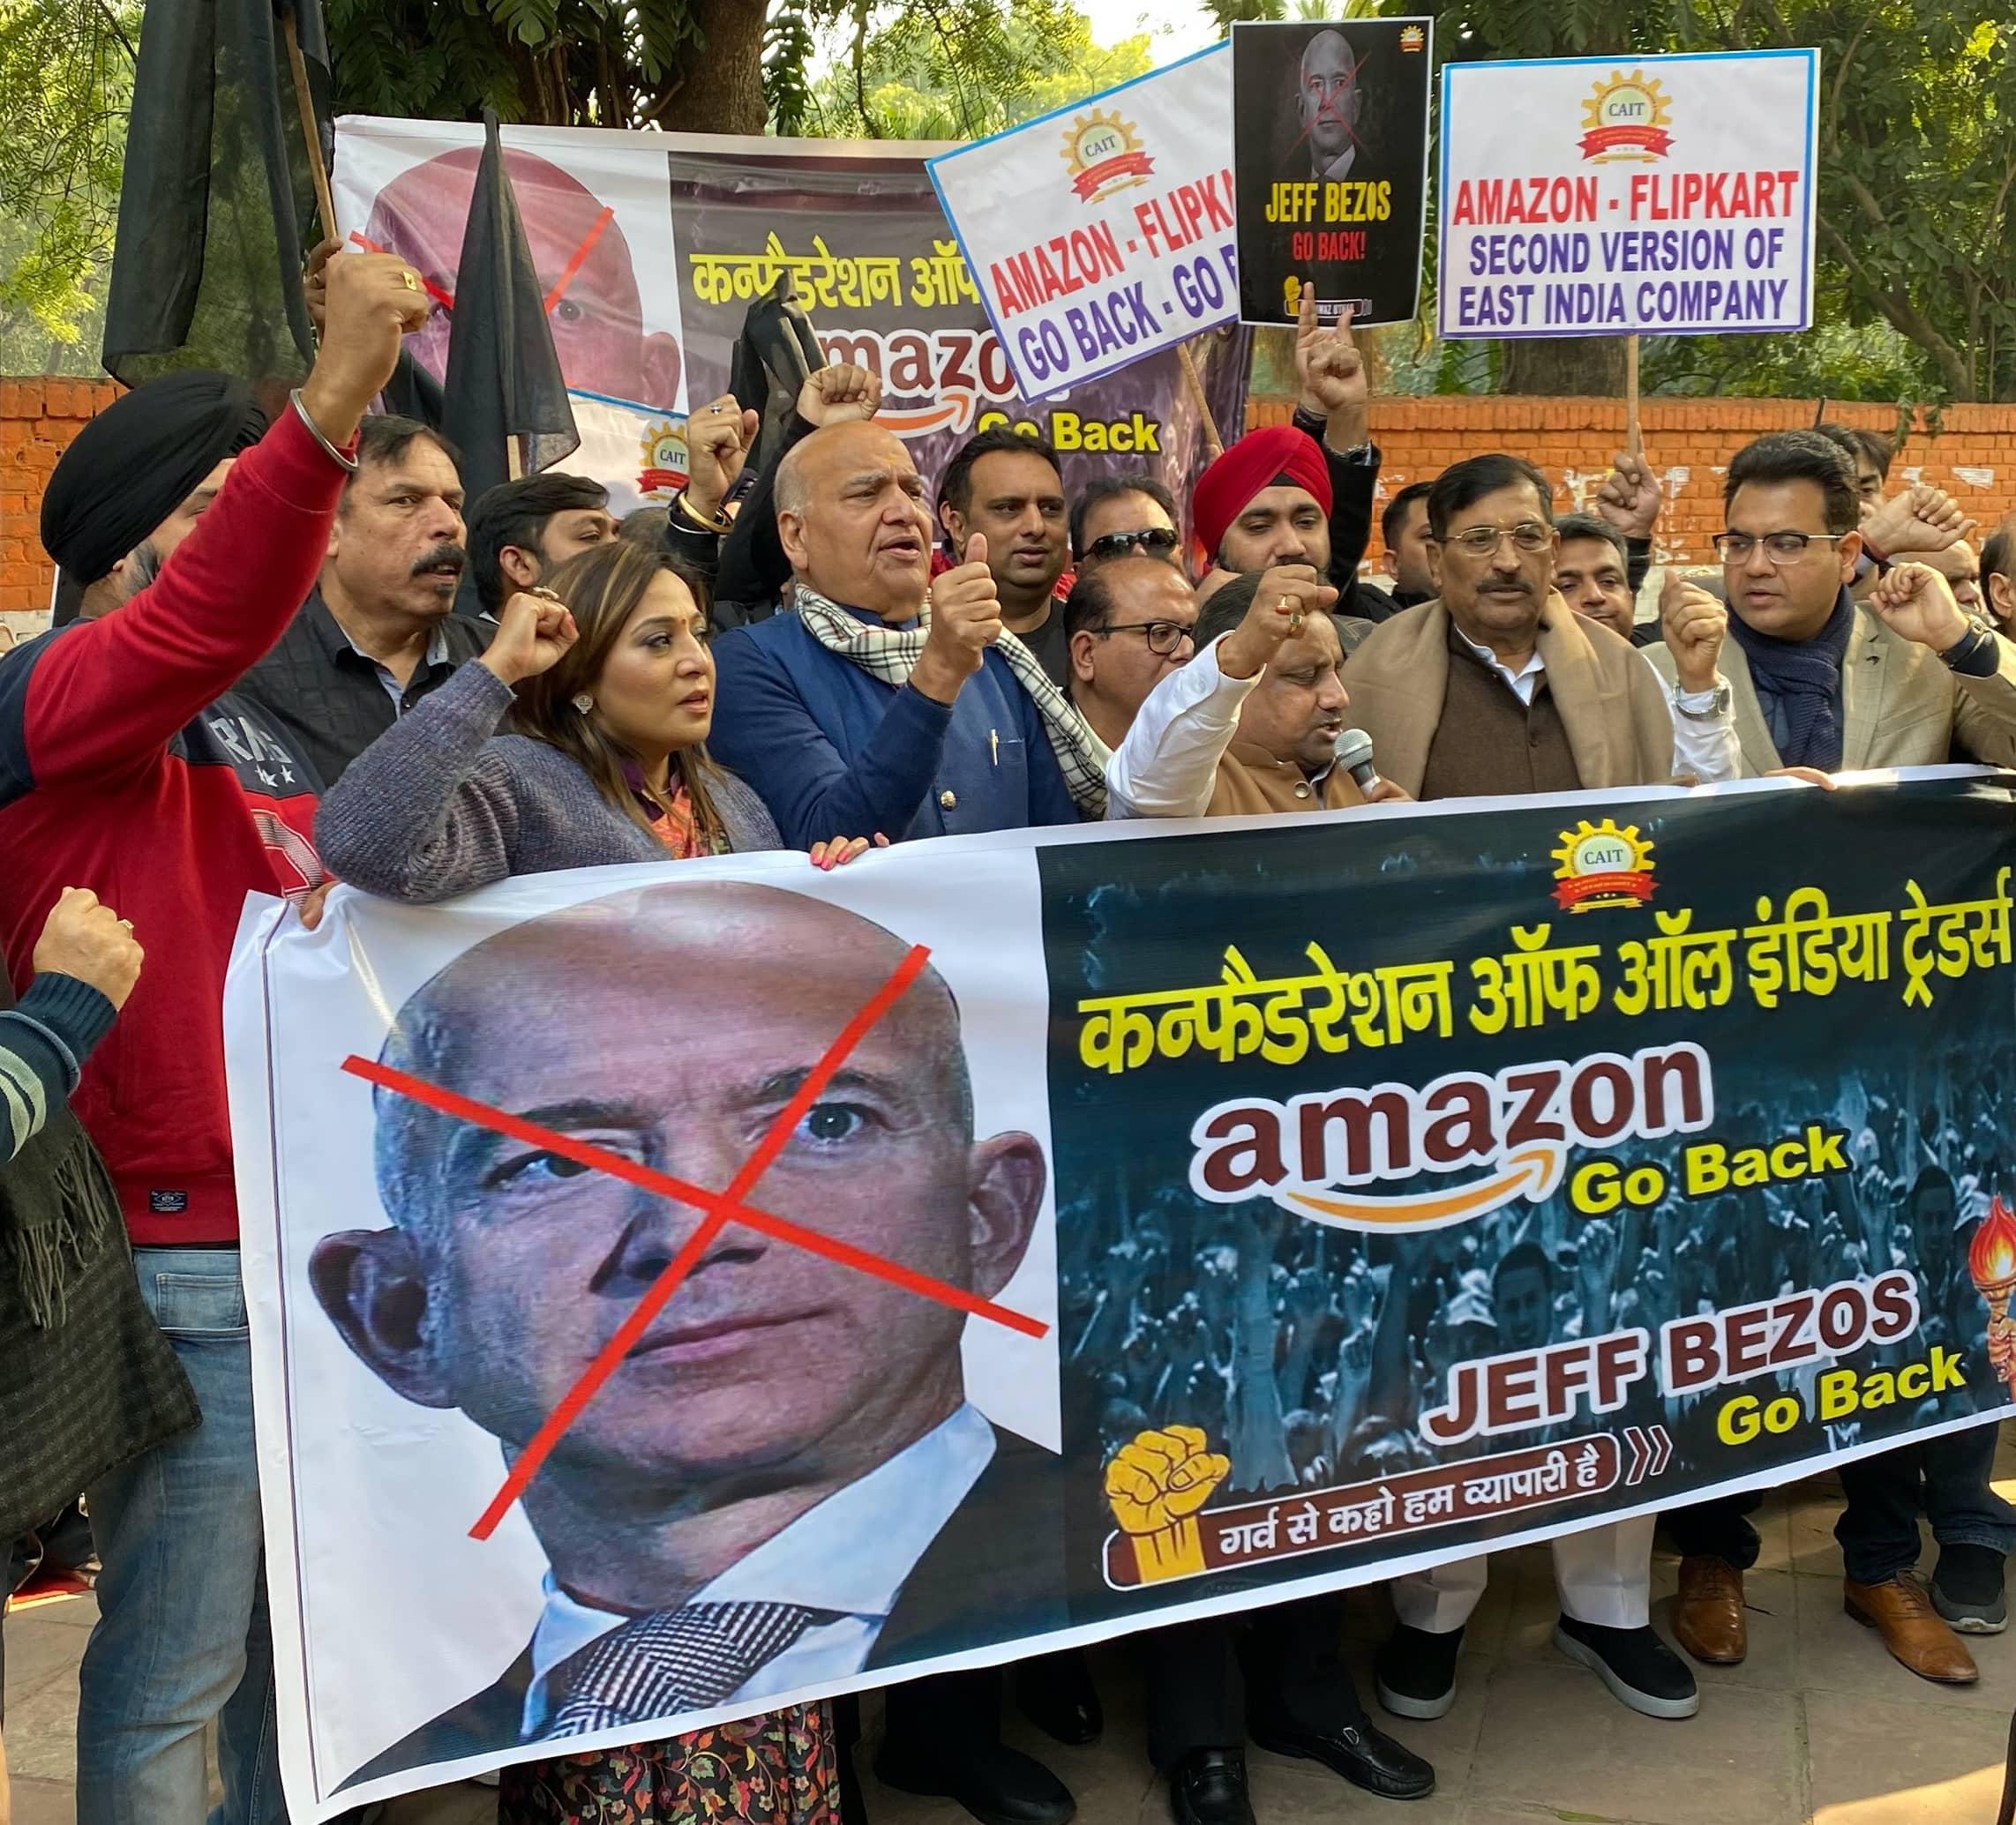 Amazon to invest $1 Billion in India